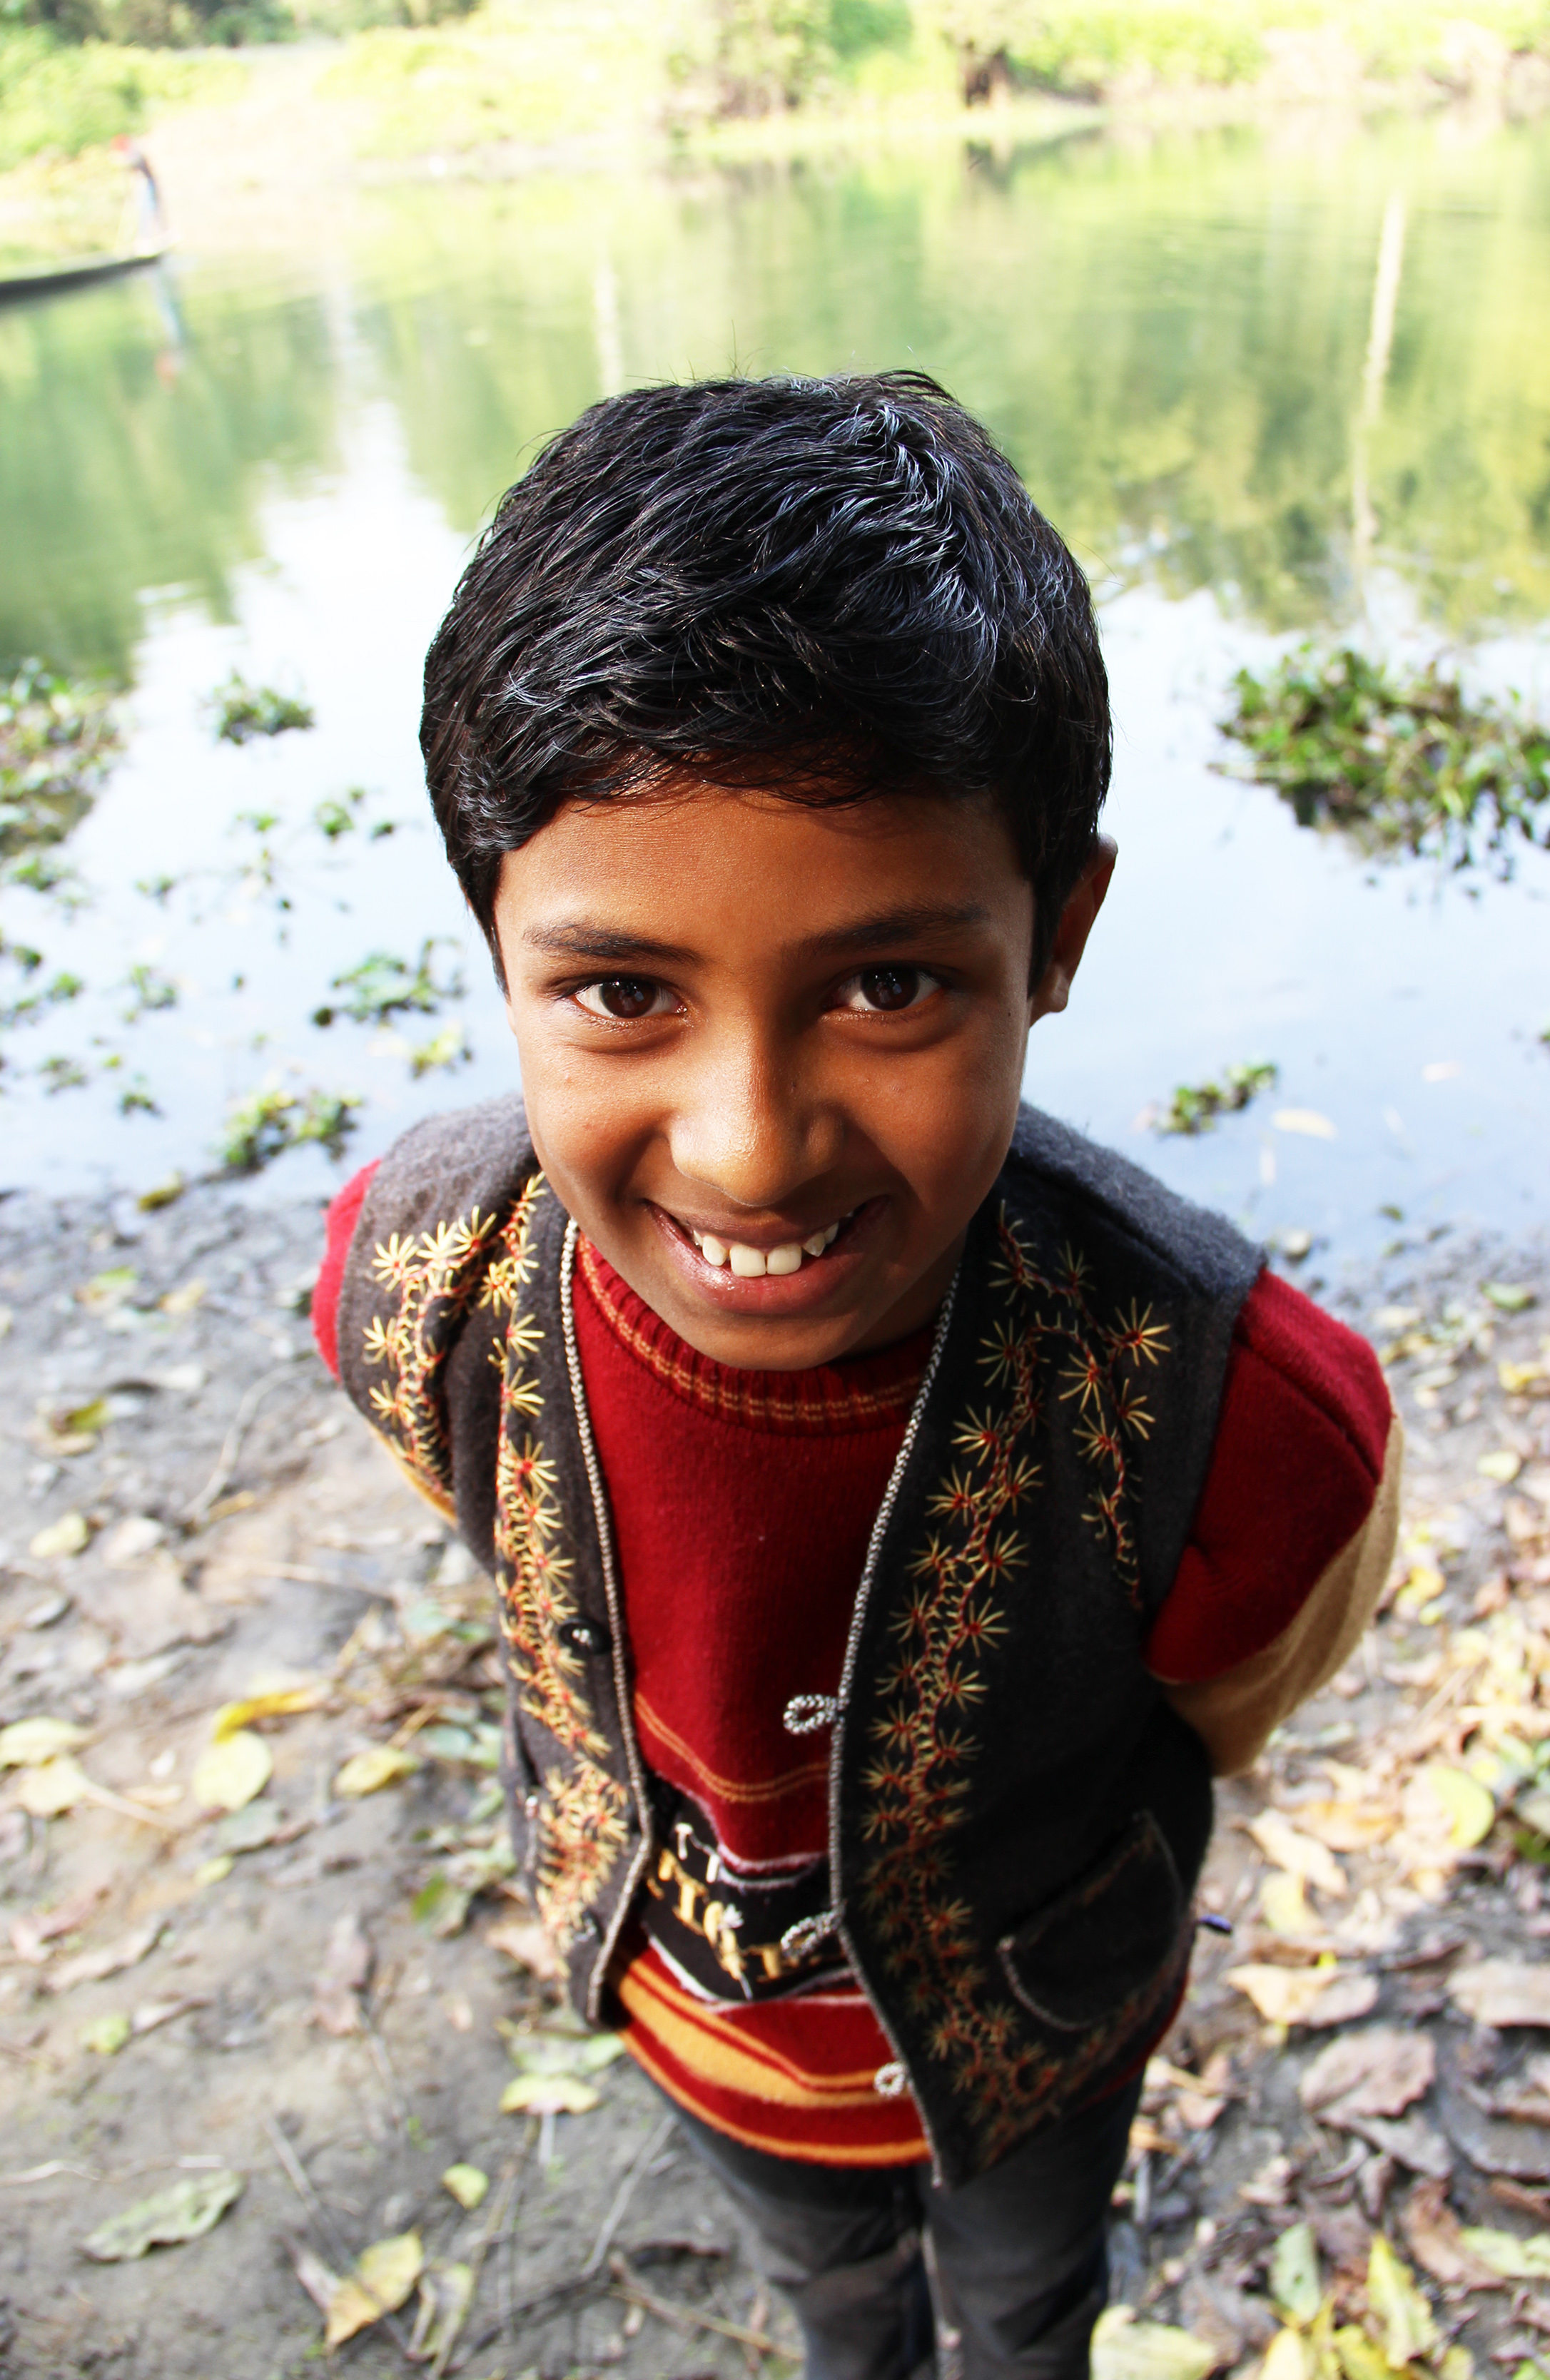 Amlan, son of Bishnu Das, along 'his' river, Majuli Island, January 2014 © Edith Nicol